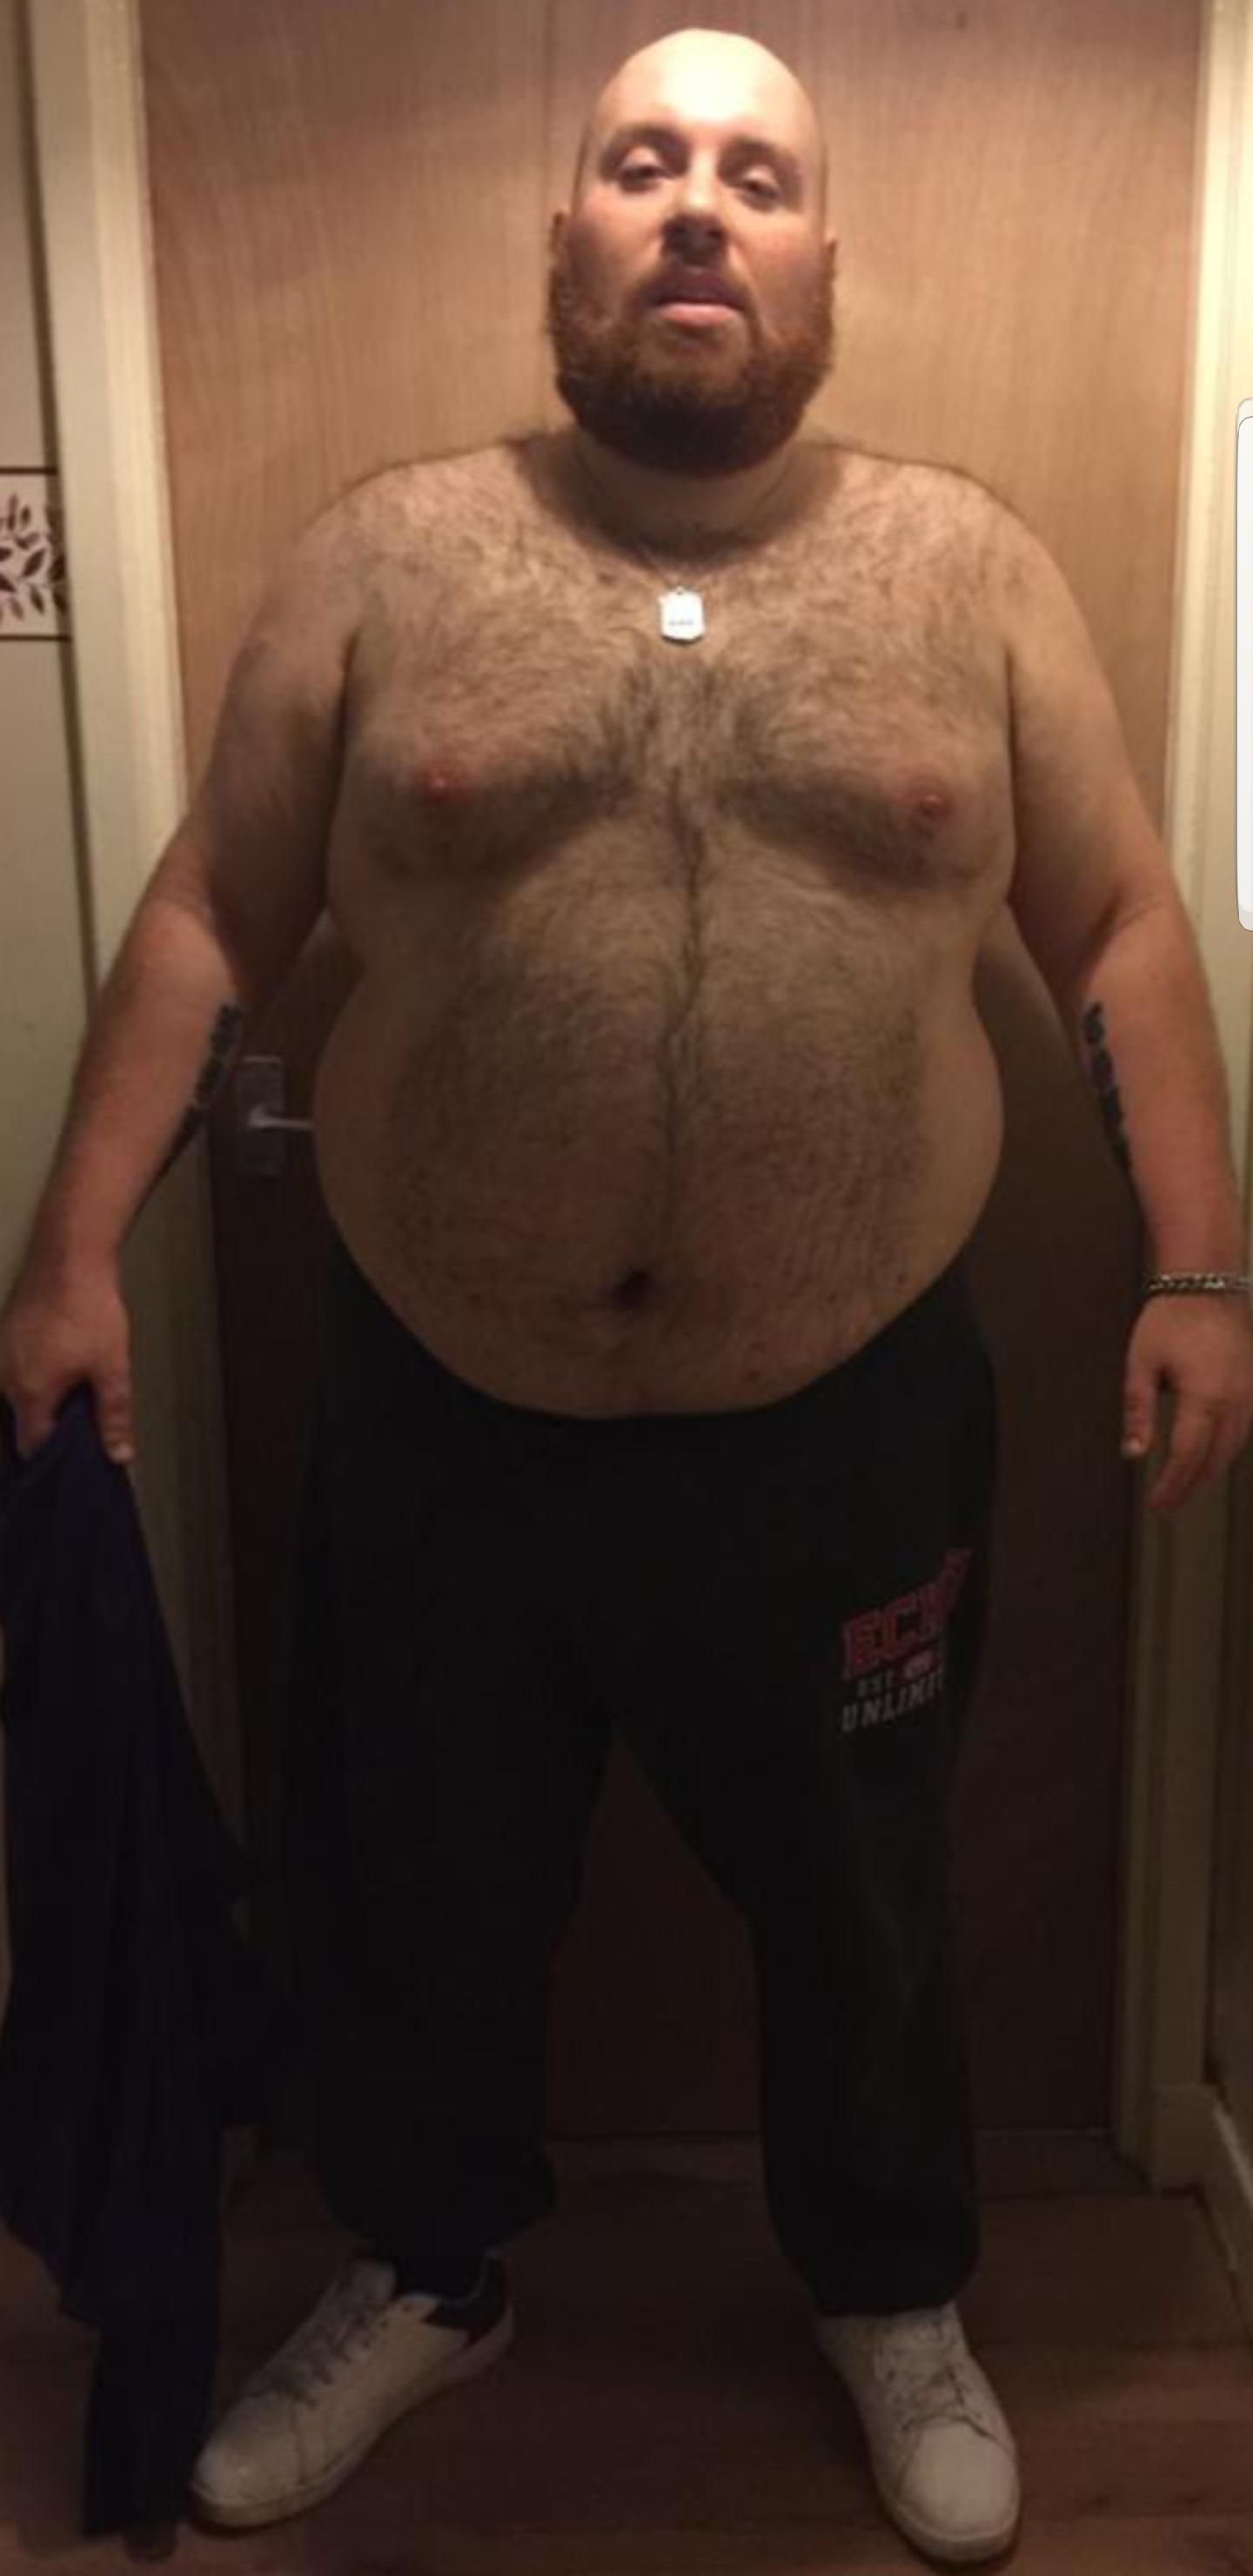 Iain before his weight loss. Credit: LADbible